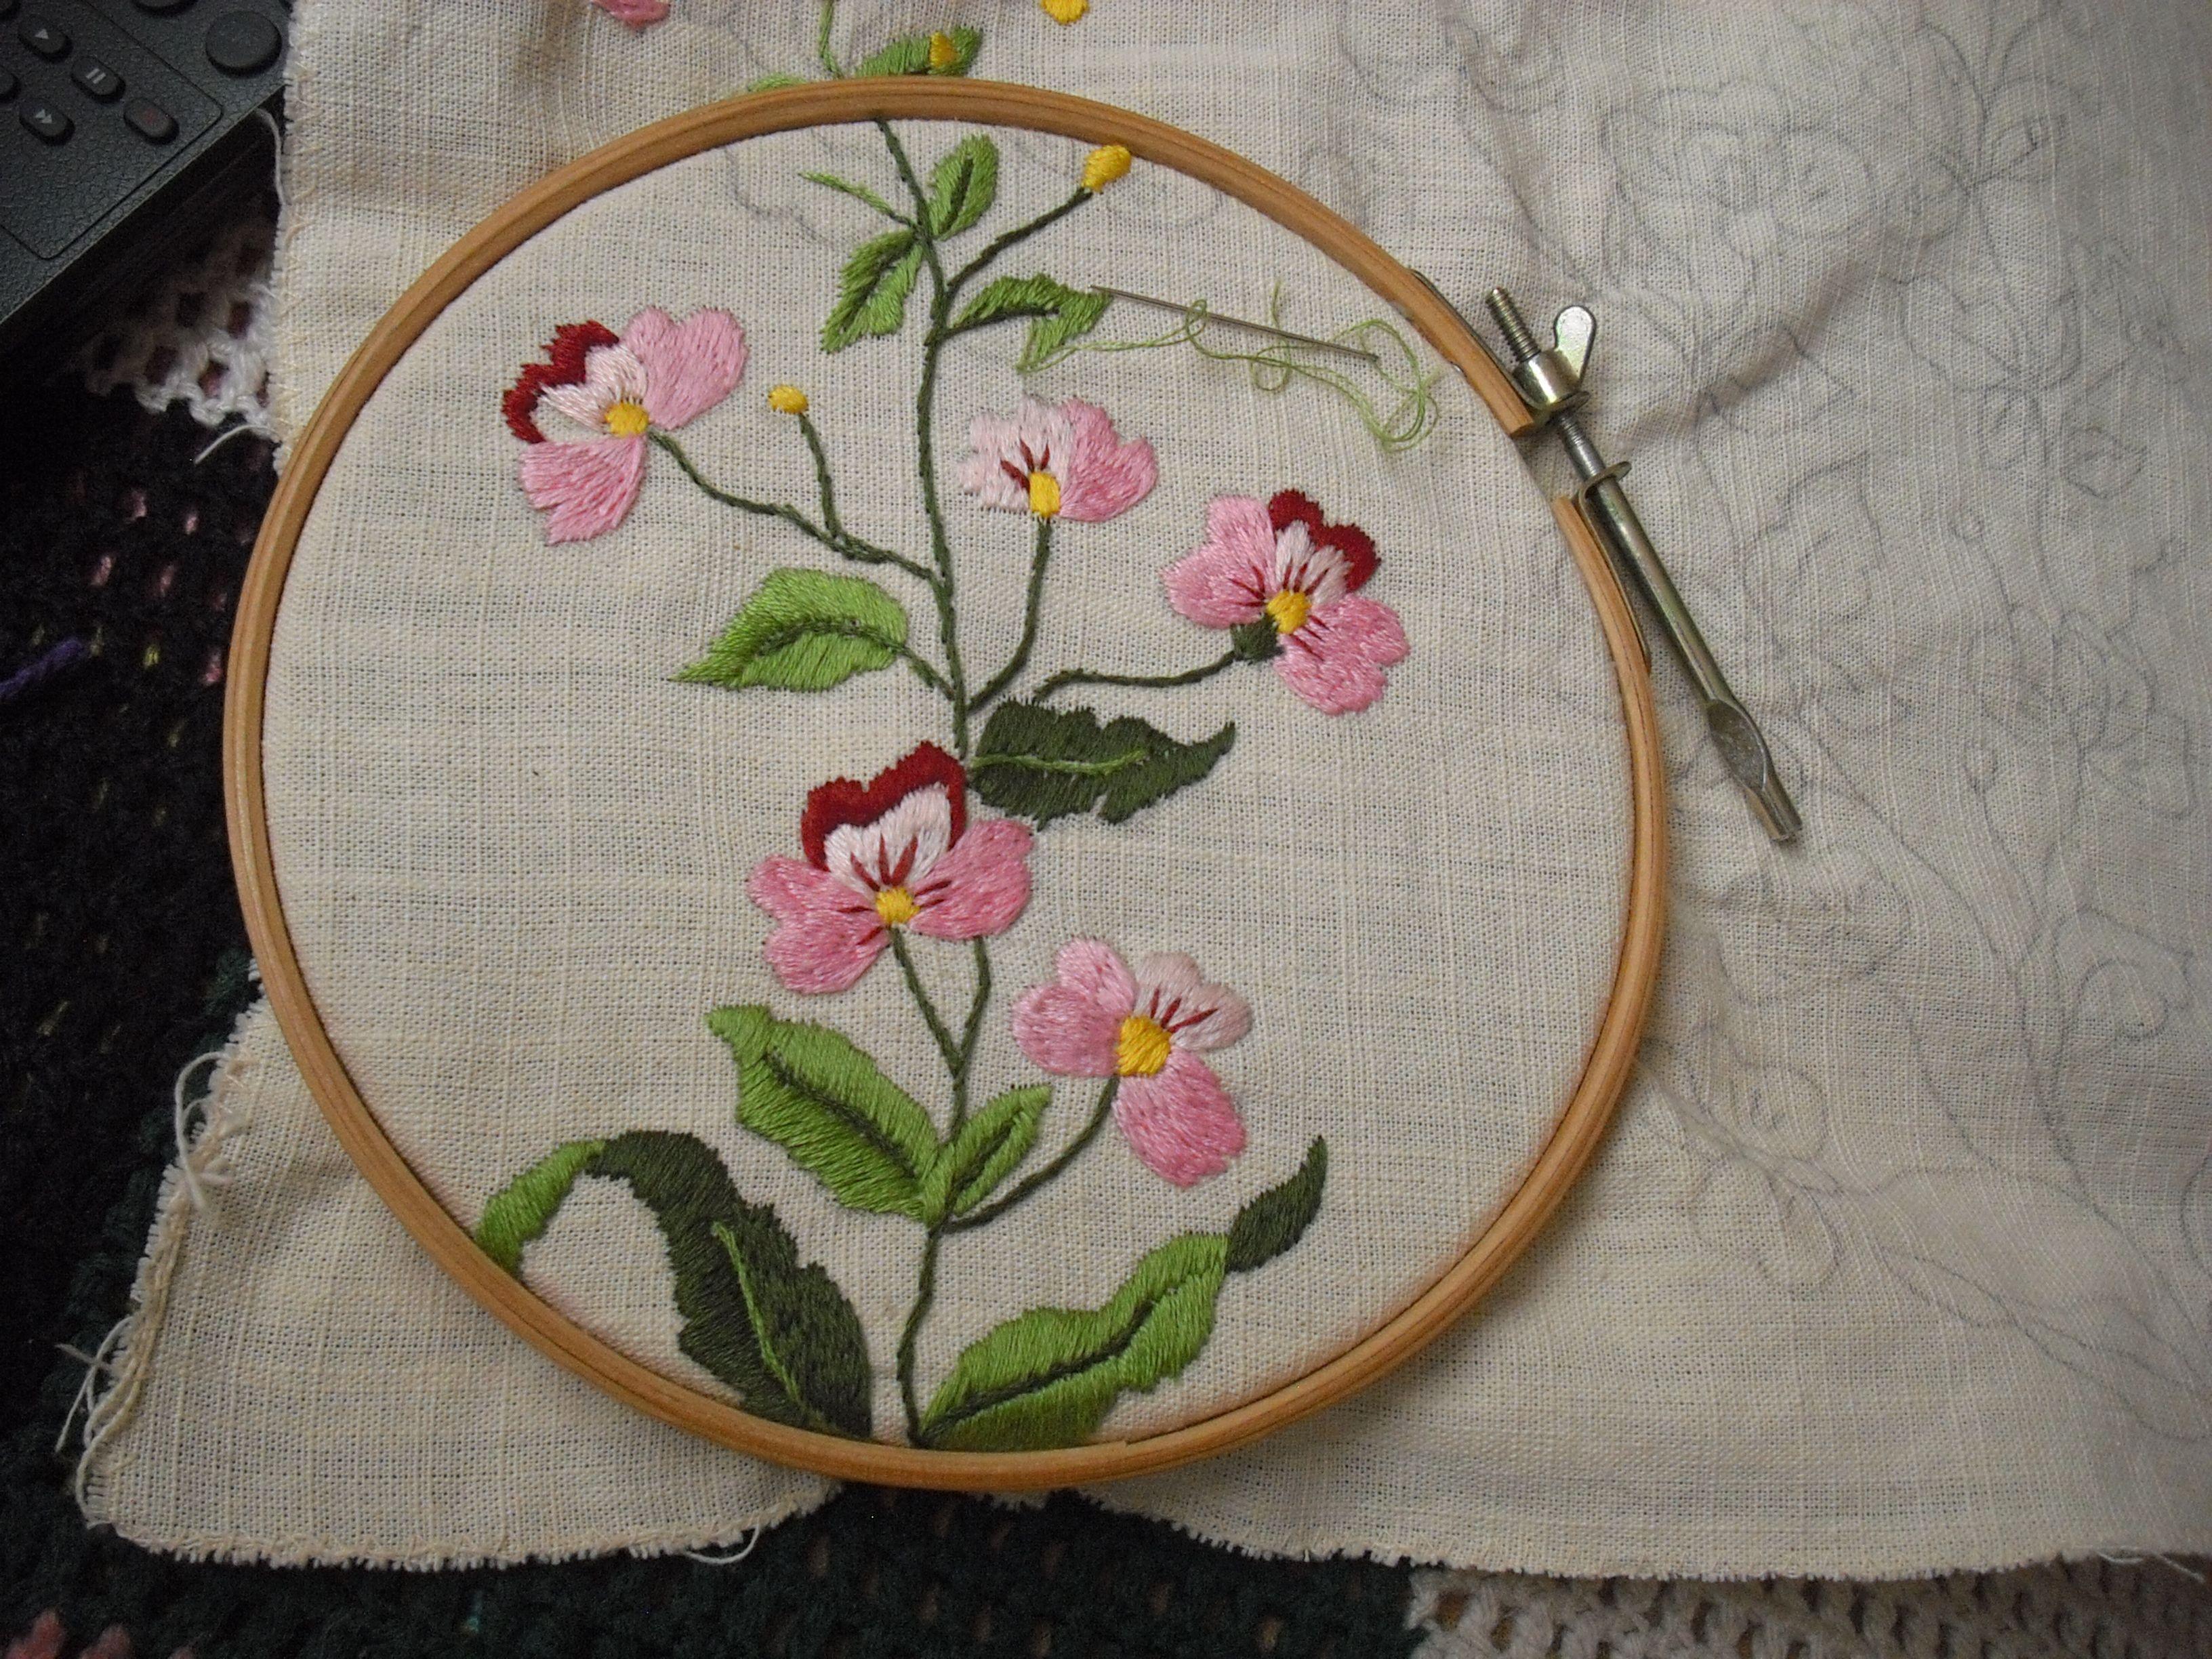 Brazilian embroidery bedspread designs - Bordado Livre Meus Bordados Livres Feito M O Embroidery Pinterest